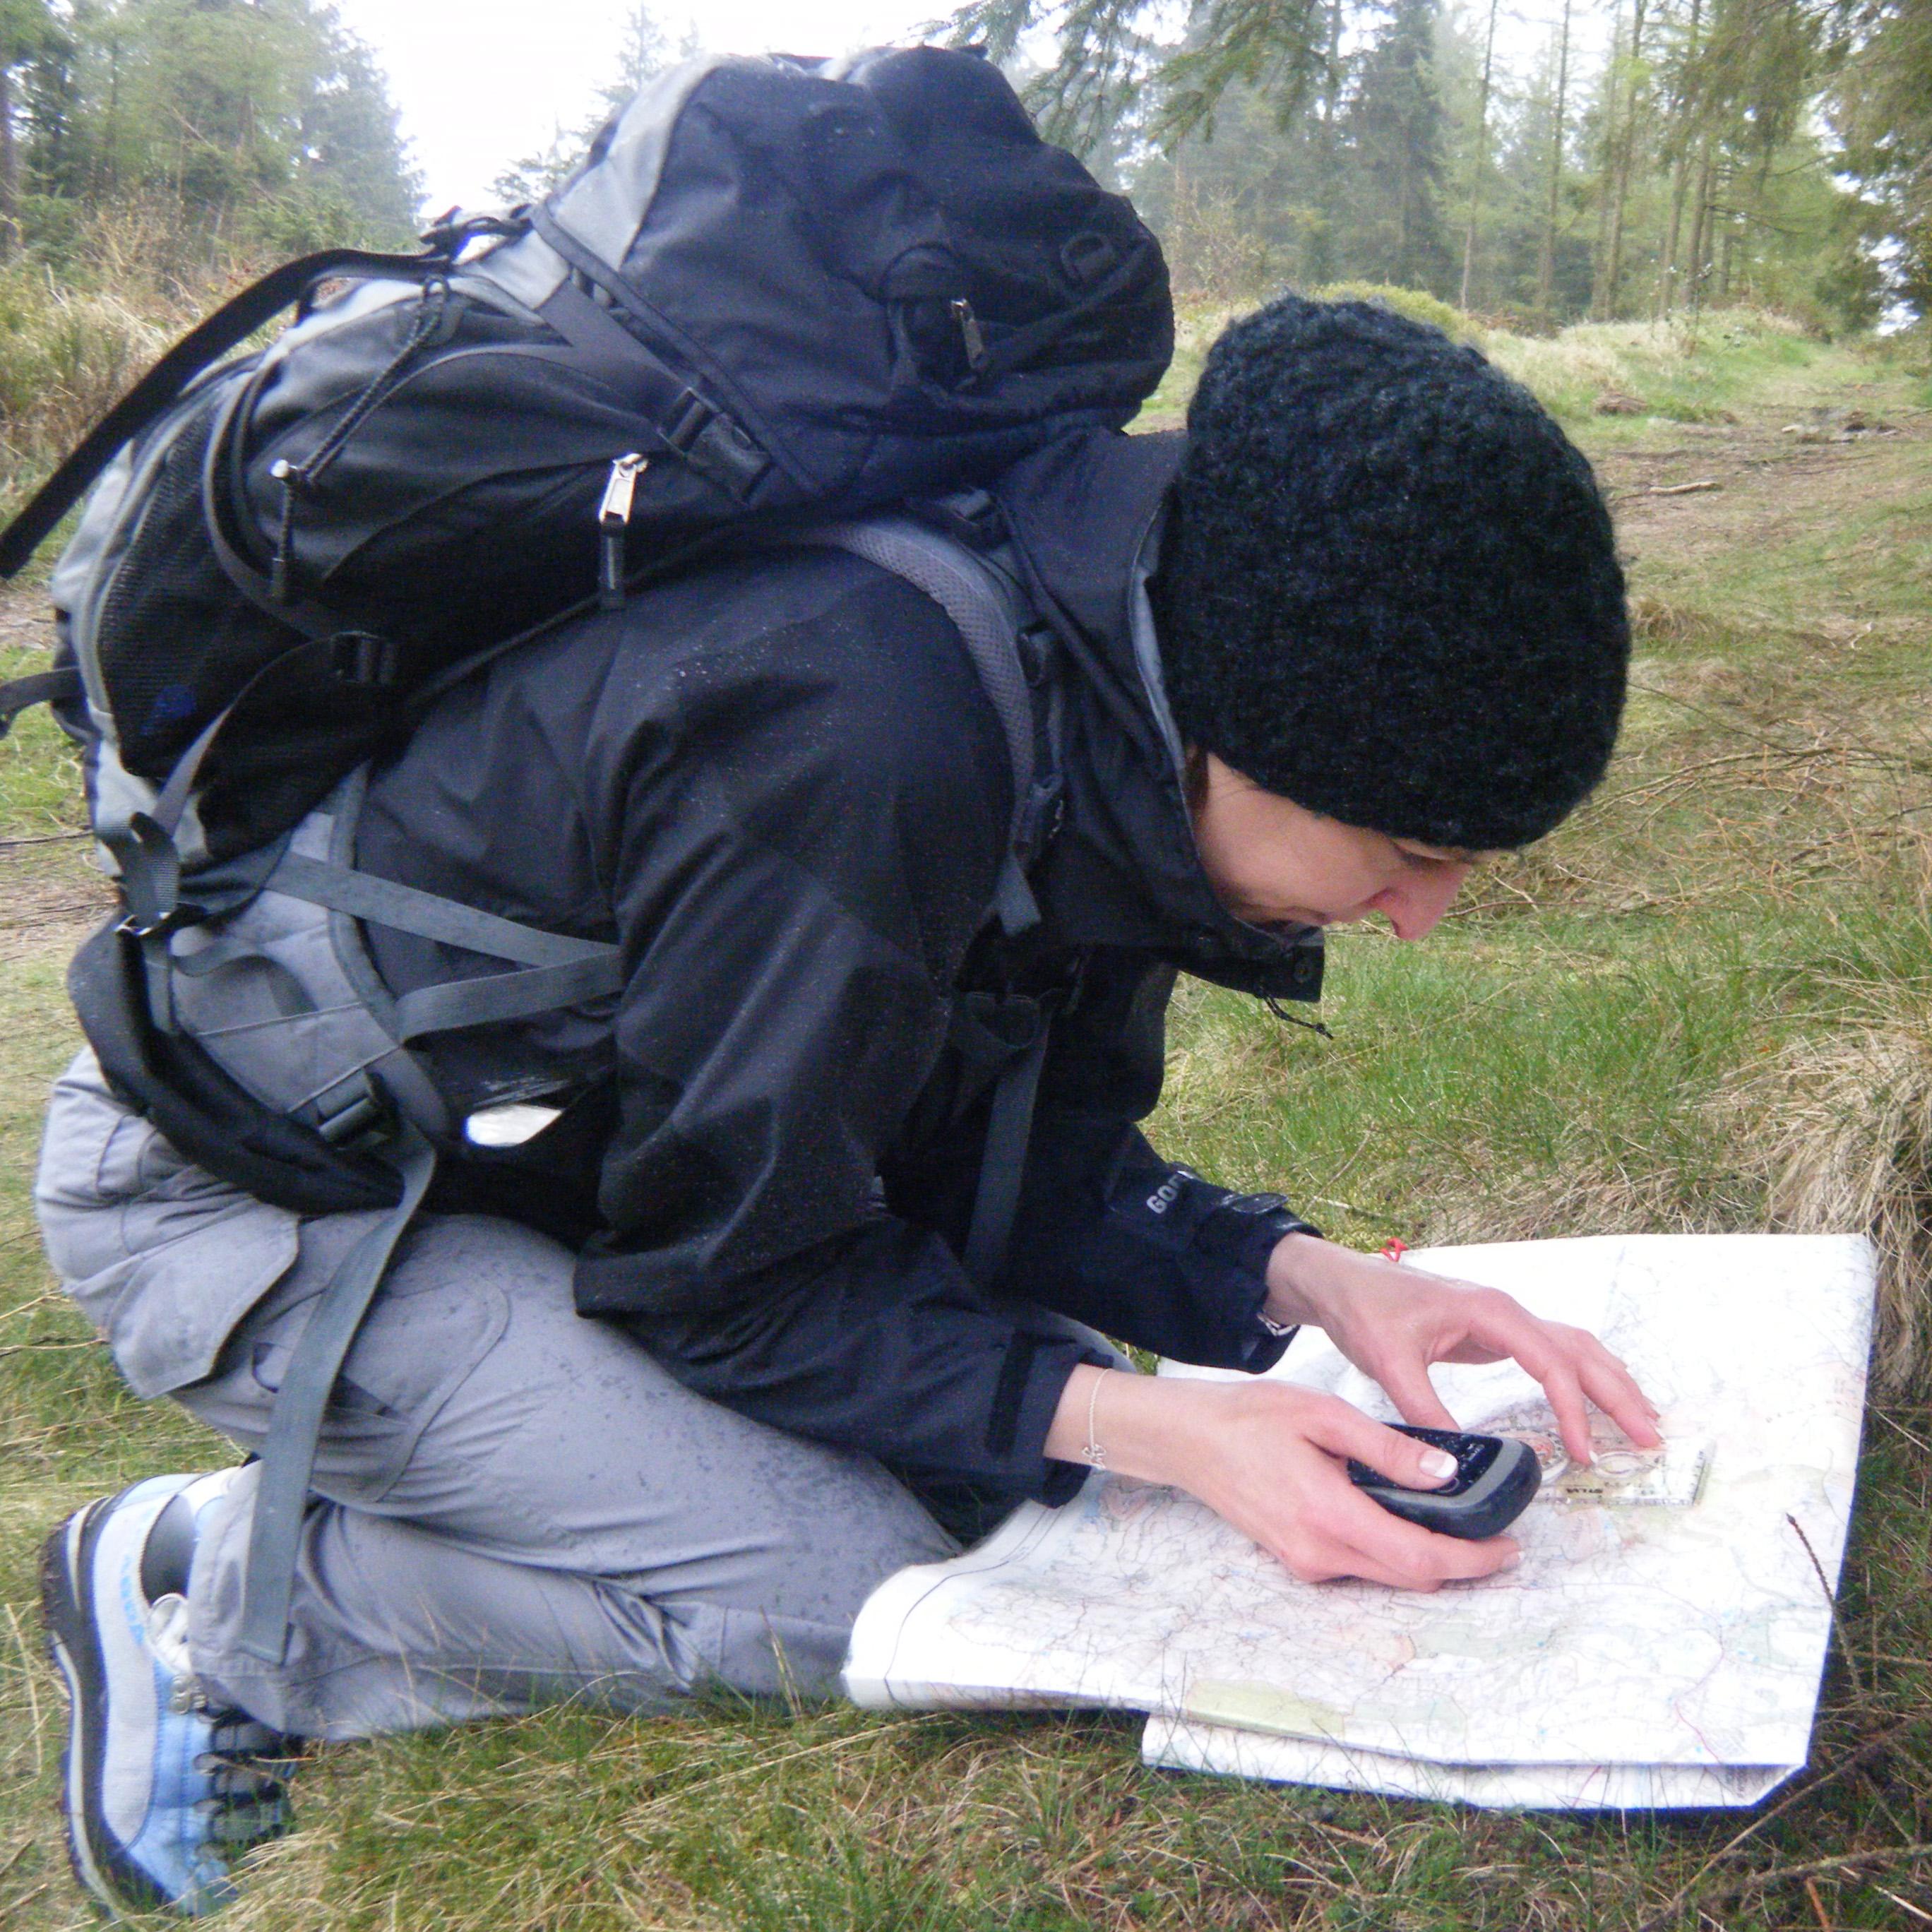 campcraft Courses in North Wales